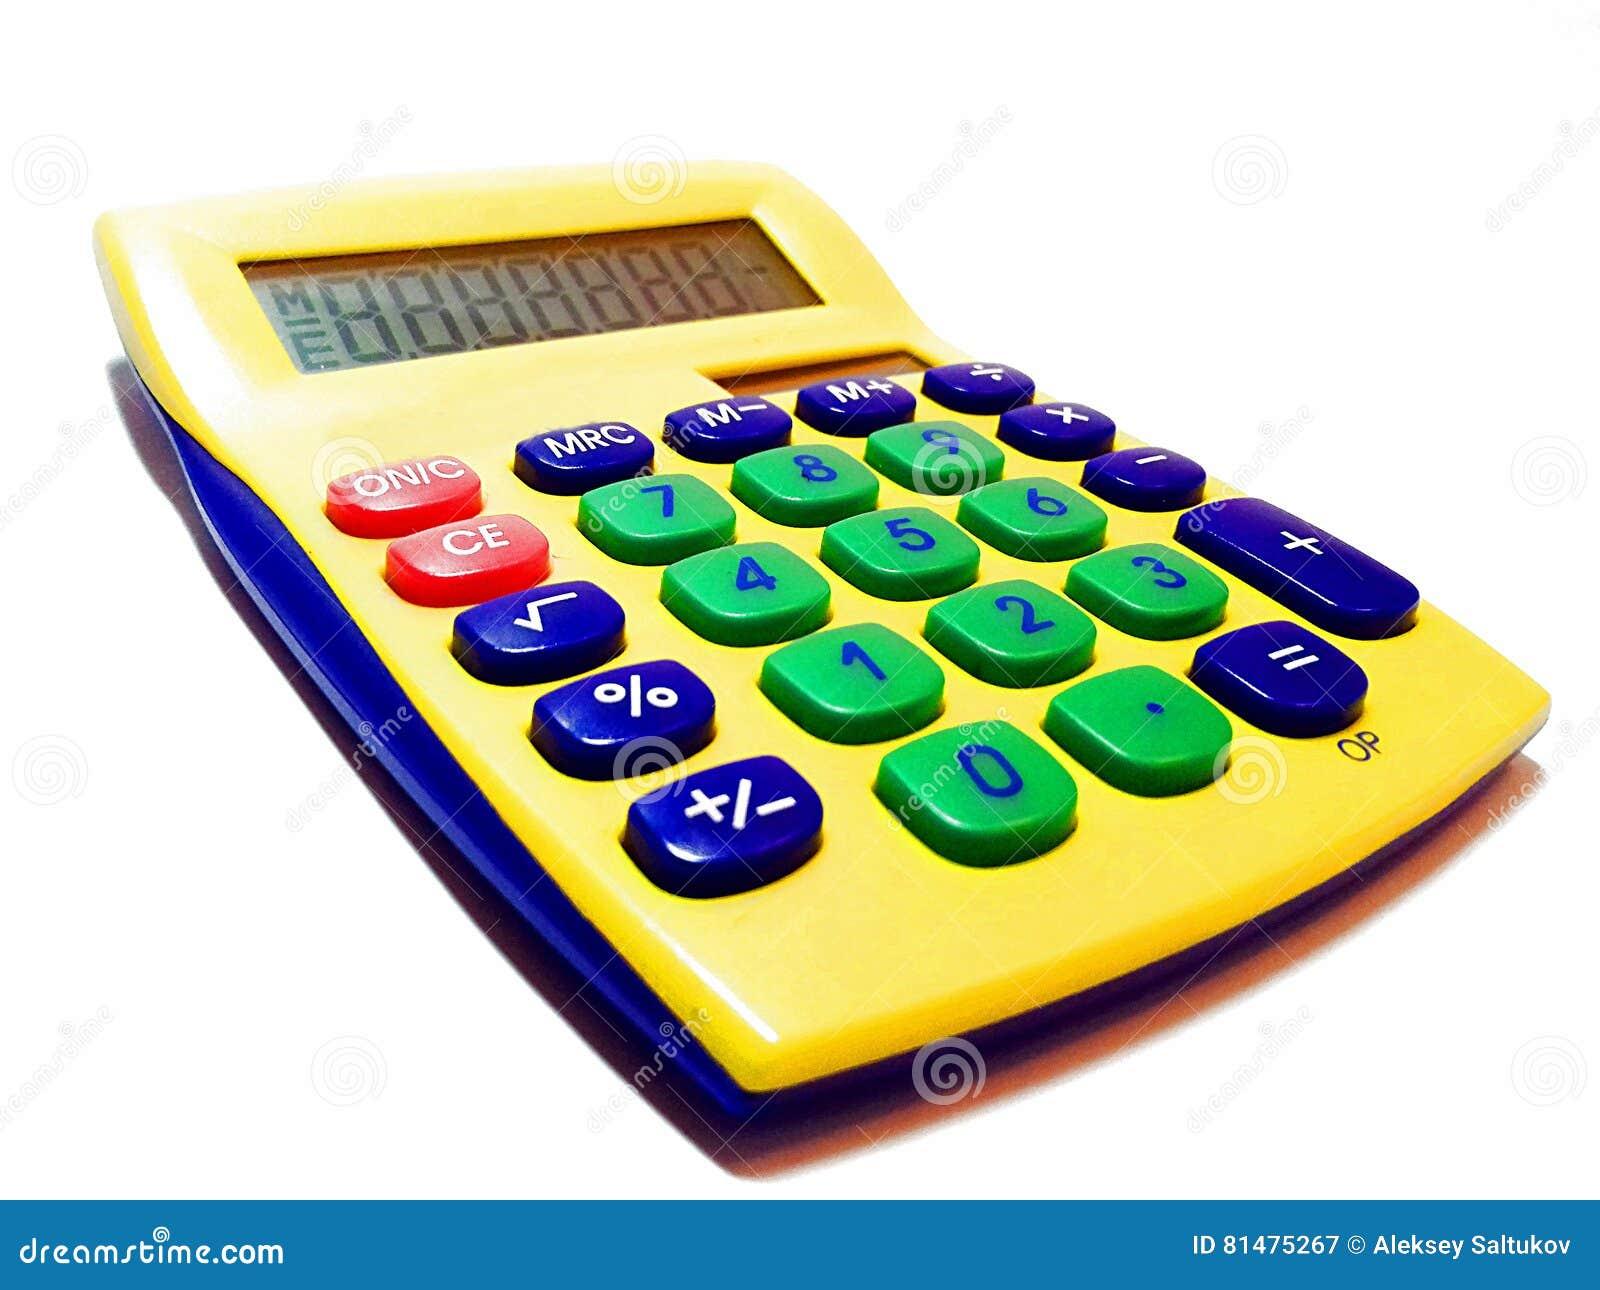 Adding Machine - Calculator Stock Image - Image of counting